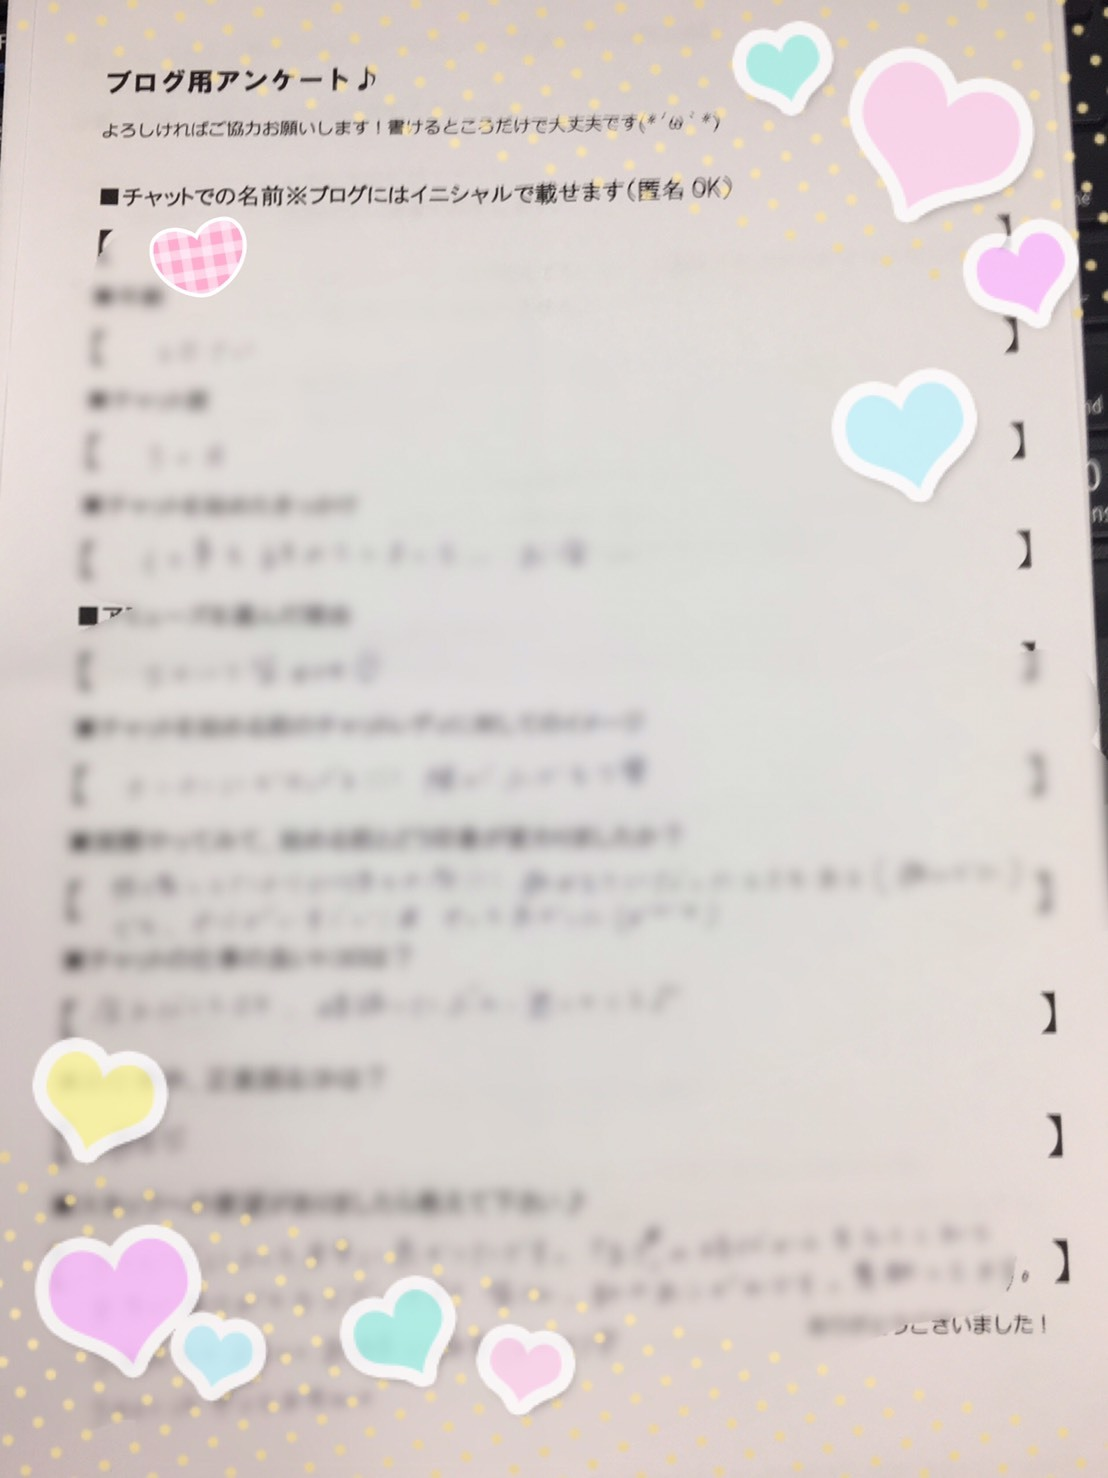 S__26705936.jpg